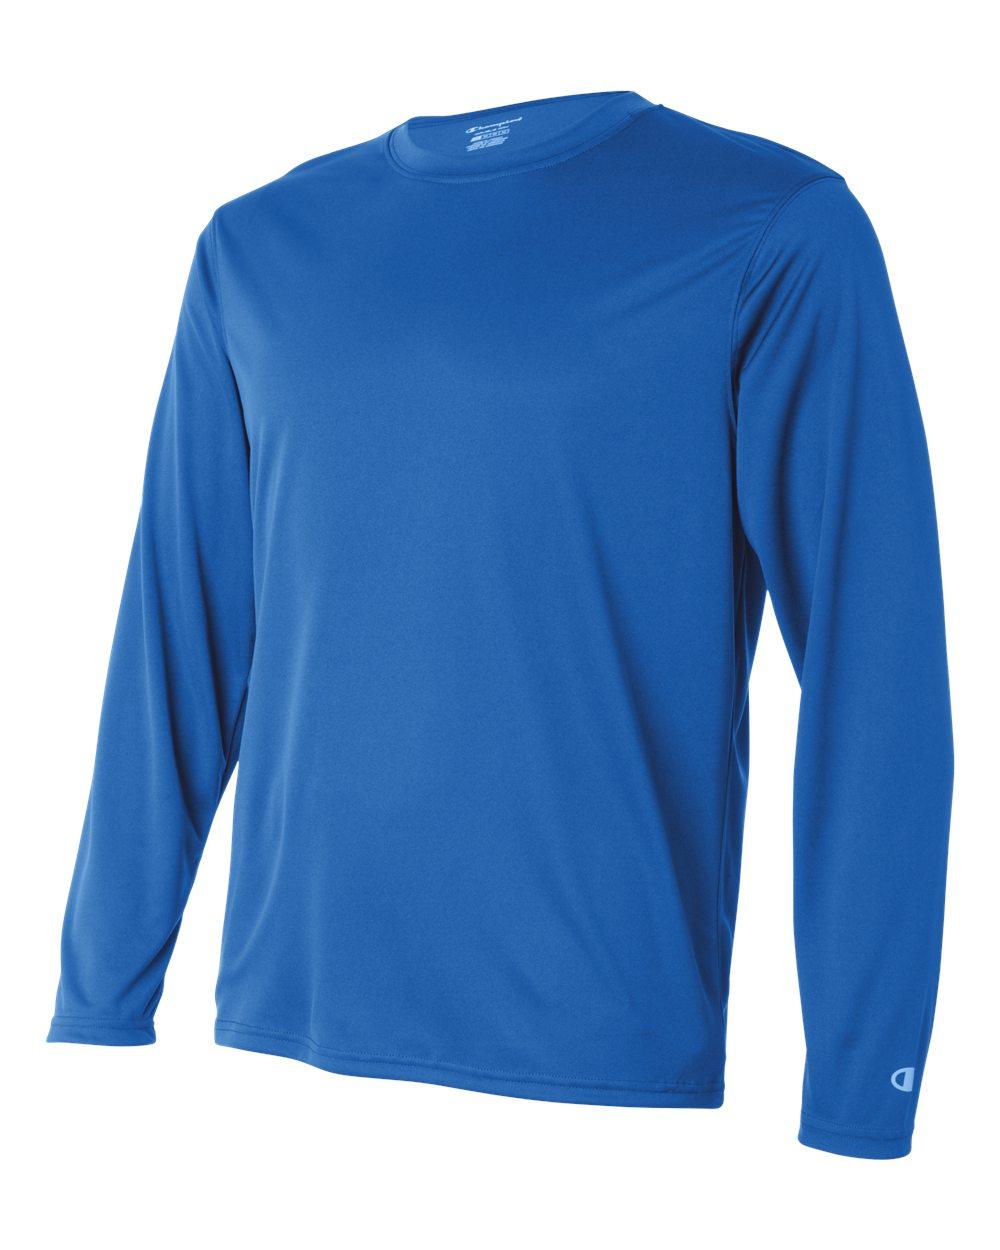 Long-Sleeve Interlock T-Shirt CW26 XS-3XL Champion Men/'s Double Dry 4.1 oz